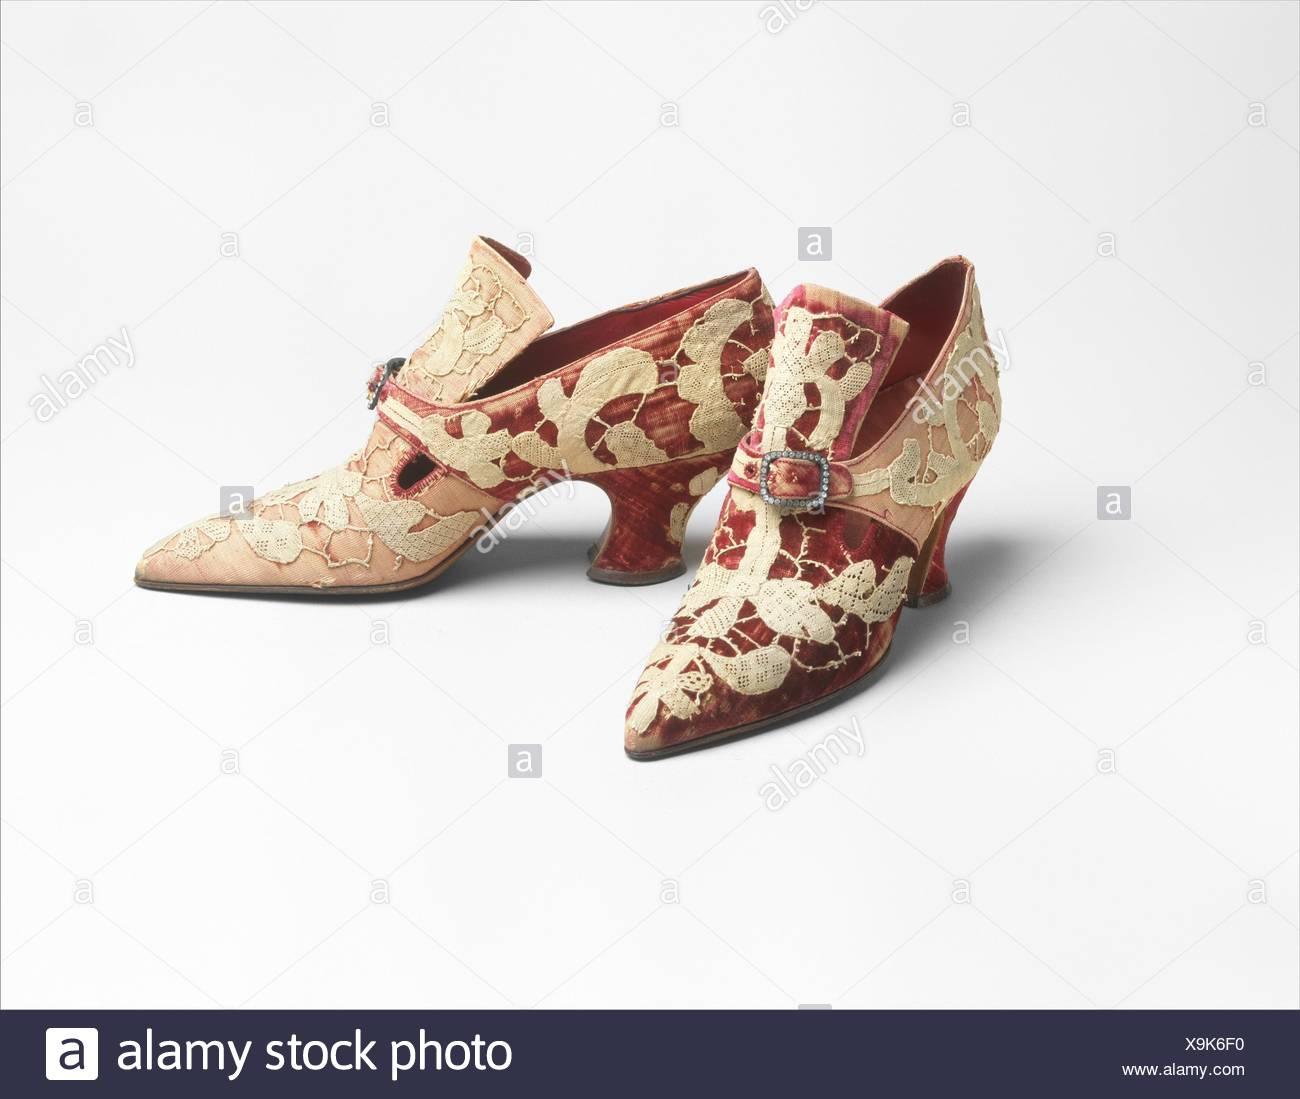 Pumps. Designer: Pierre Yantorny (Italian, 1874-1936); Date: 1914-19; Culture: French; Medium: leather, silk; Credit Line: Gift of Capezio Inc., 1953 - Stock Image